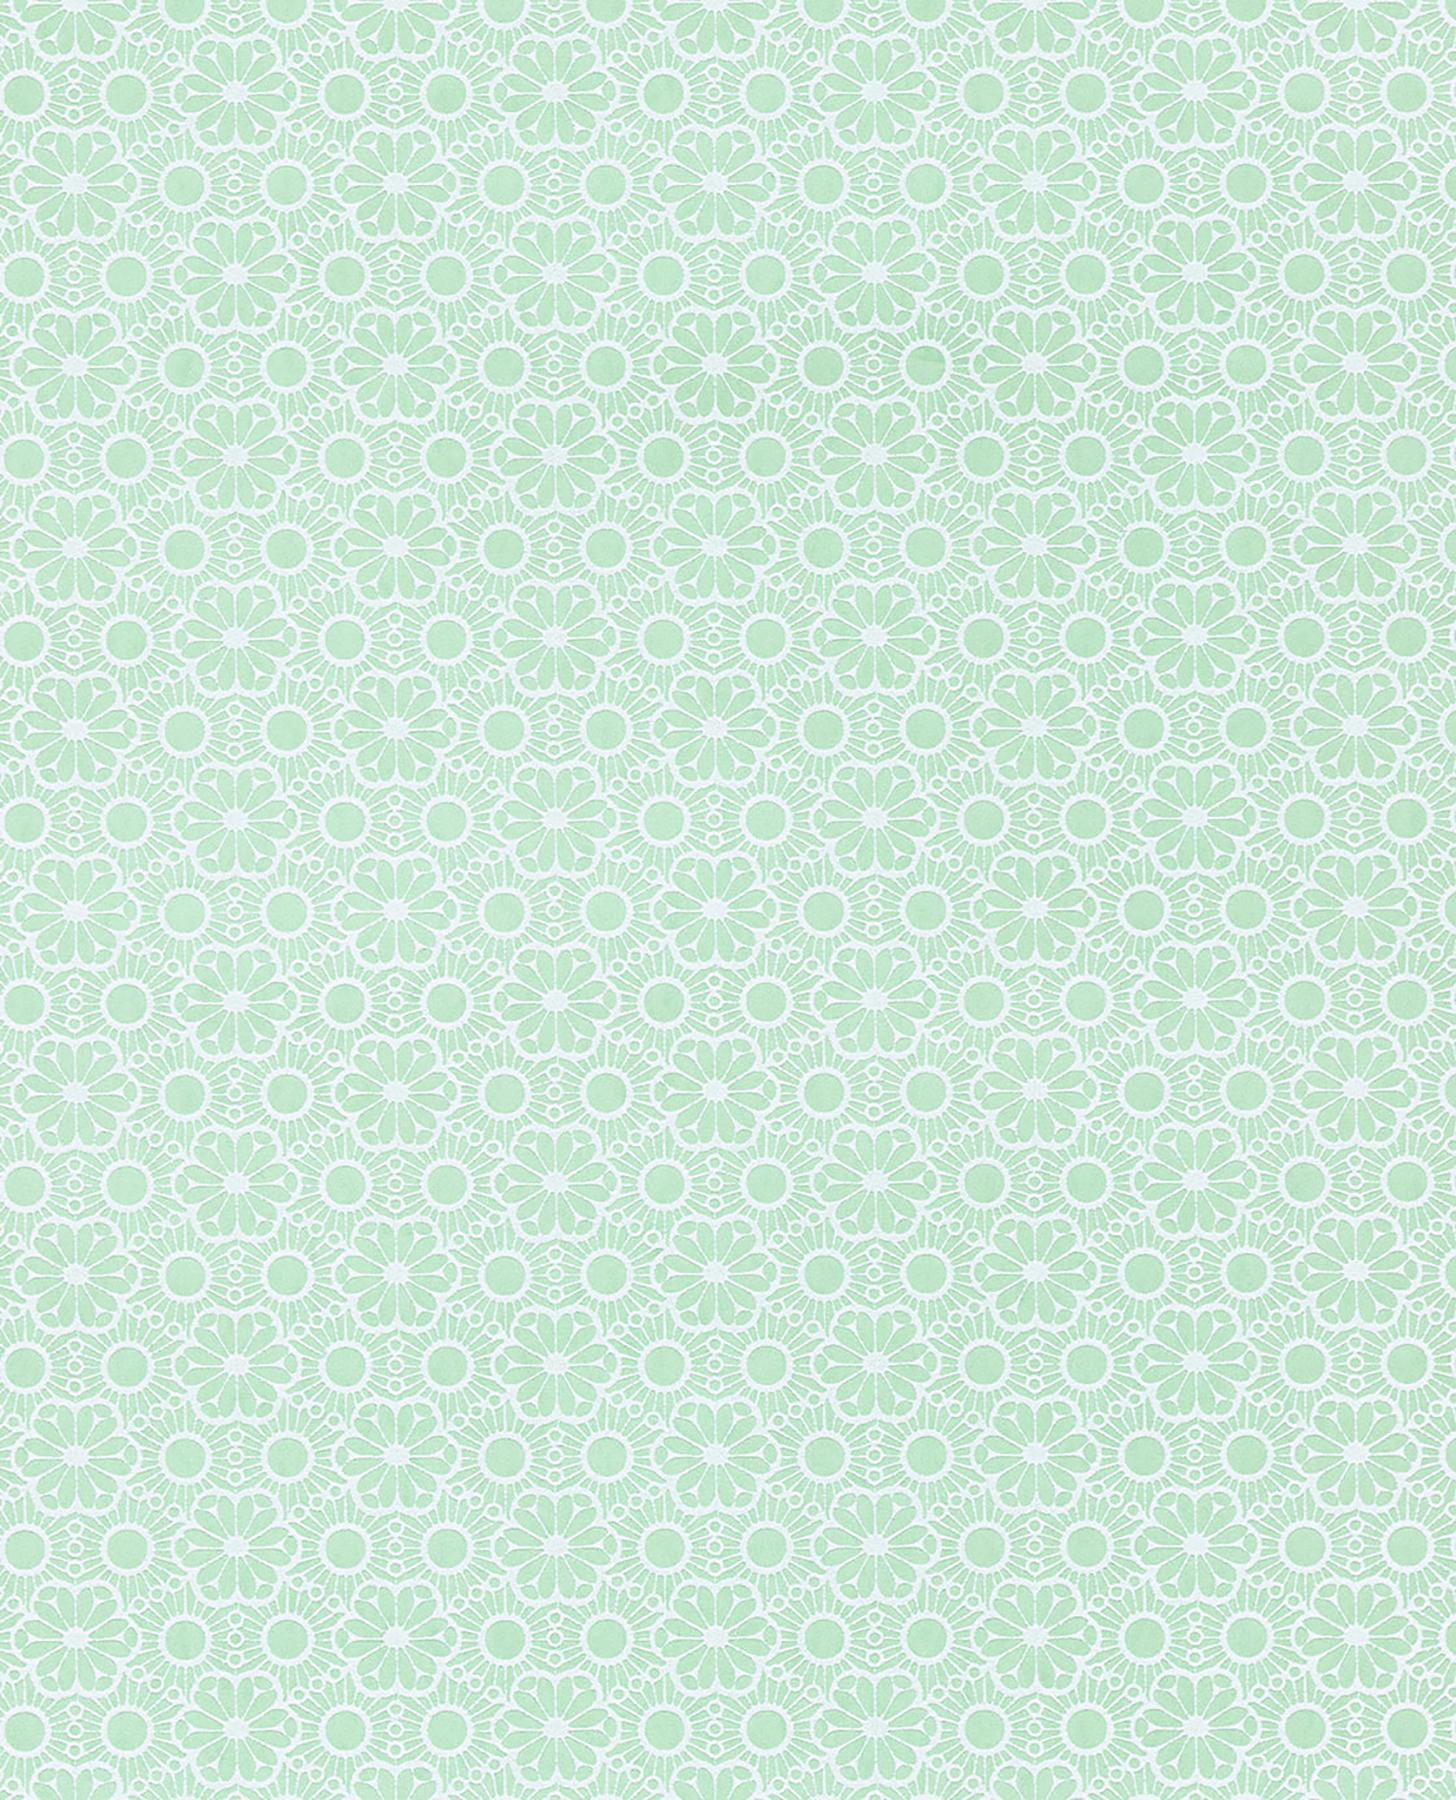 Picture of Arielle Mint Marrakesh Wallpaper